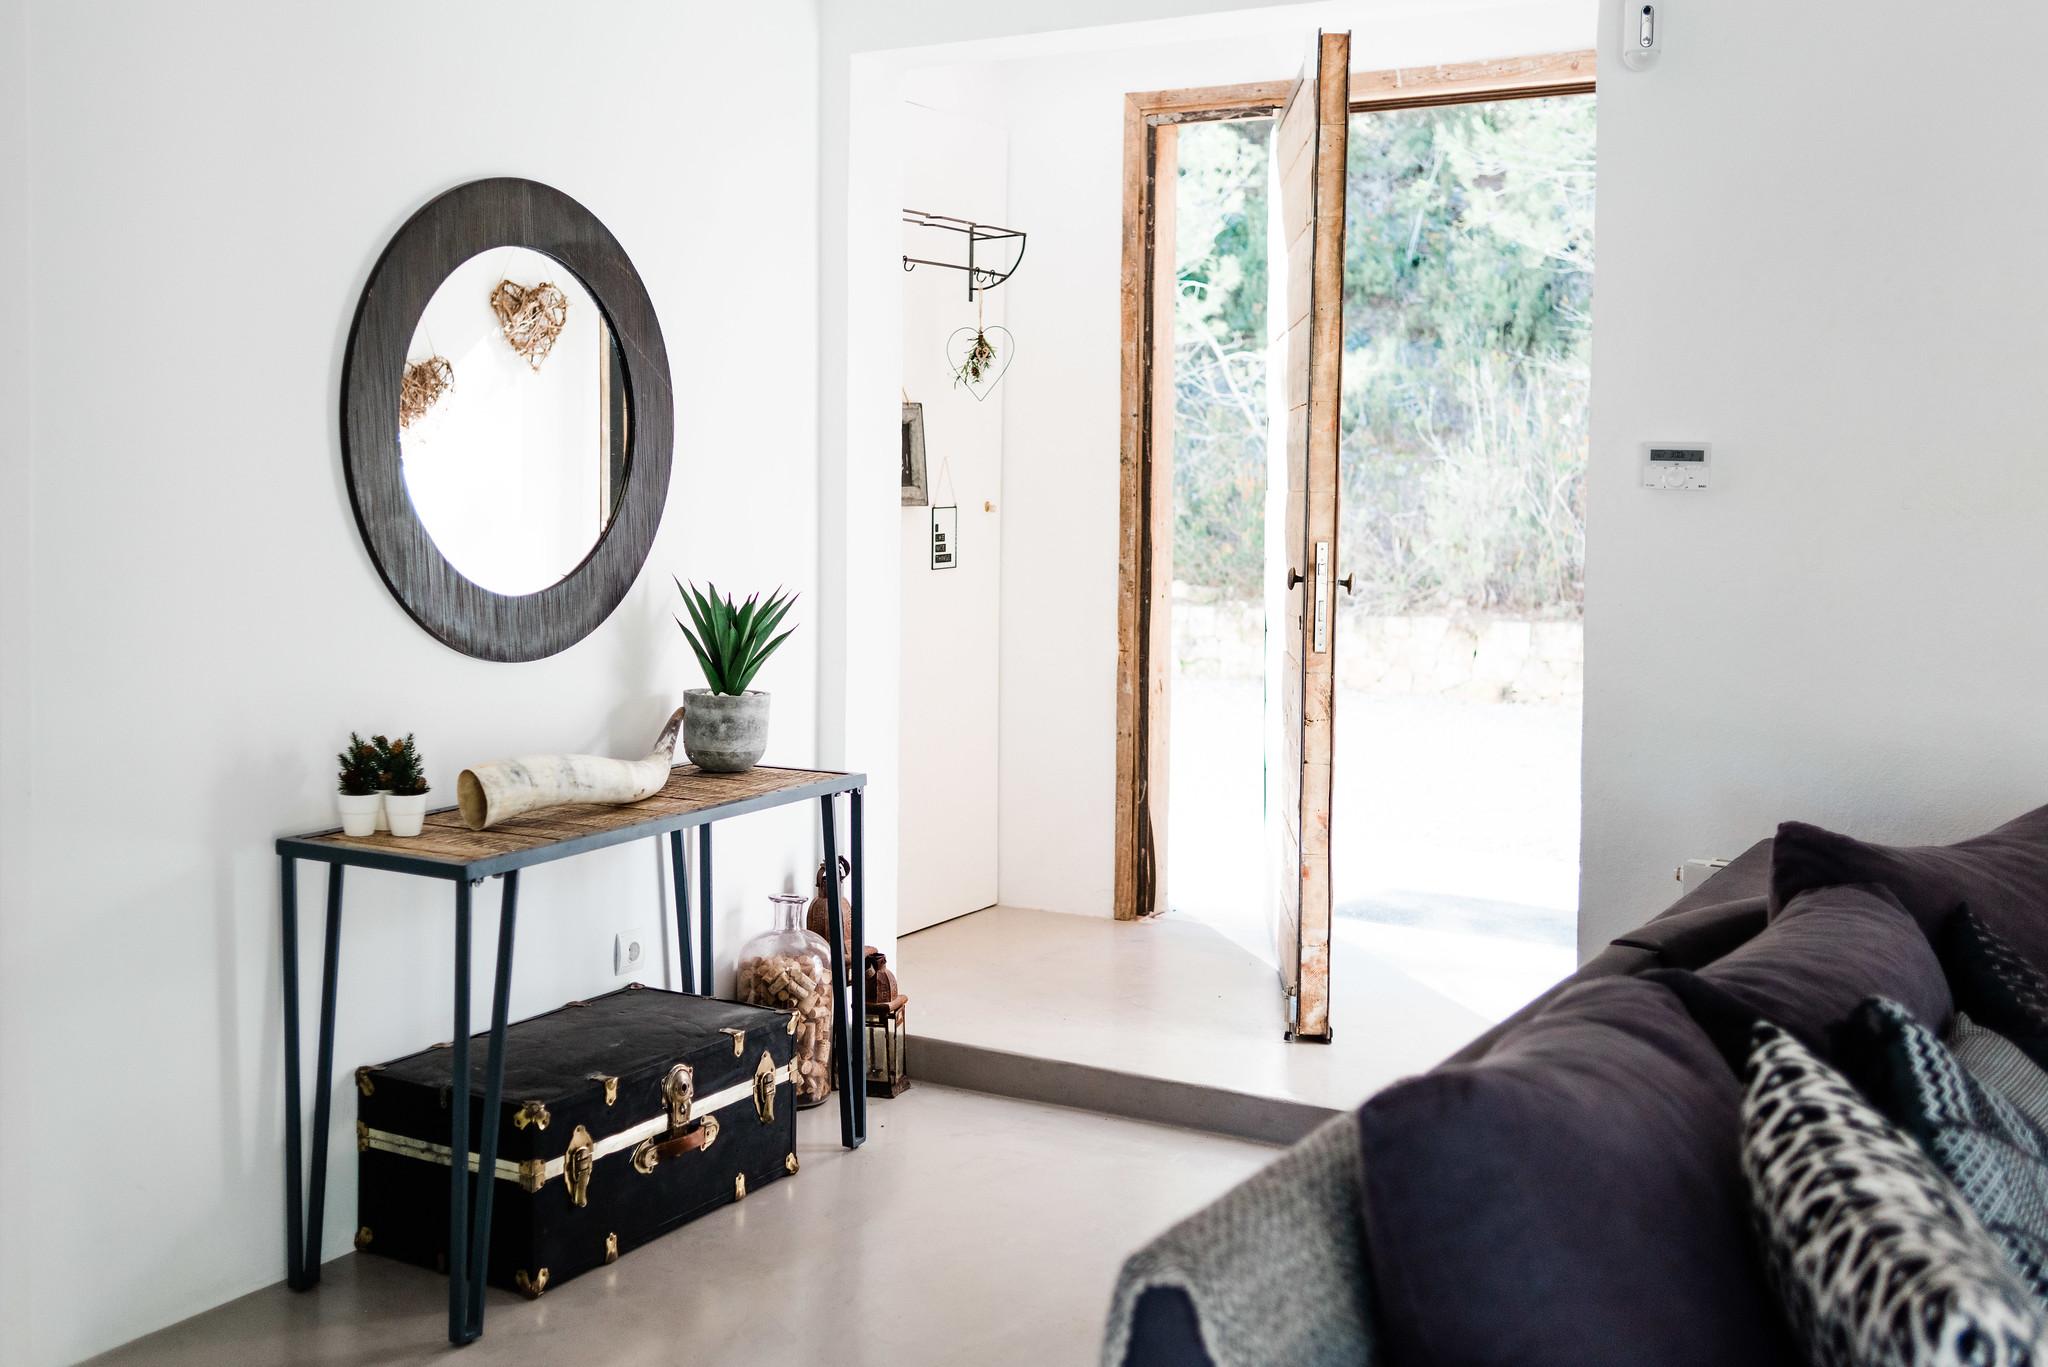 https://www.white-ibiza.com/wp-content/uploads/2020/05/white-ibiza-villas-can-verde-interior-front-door.jpg